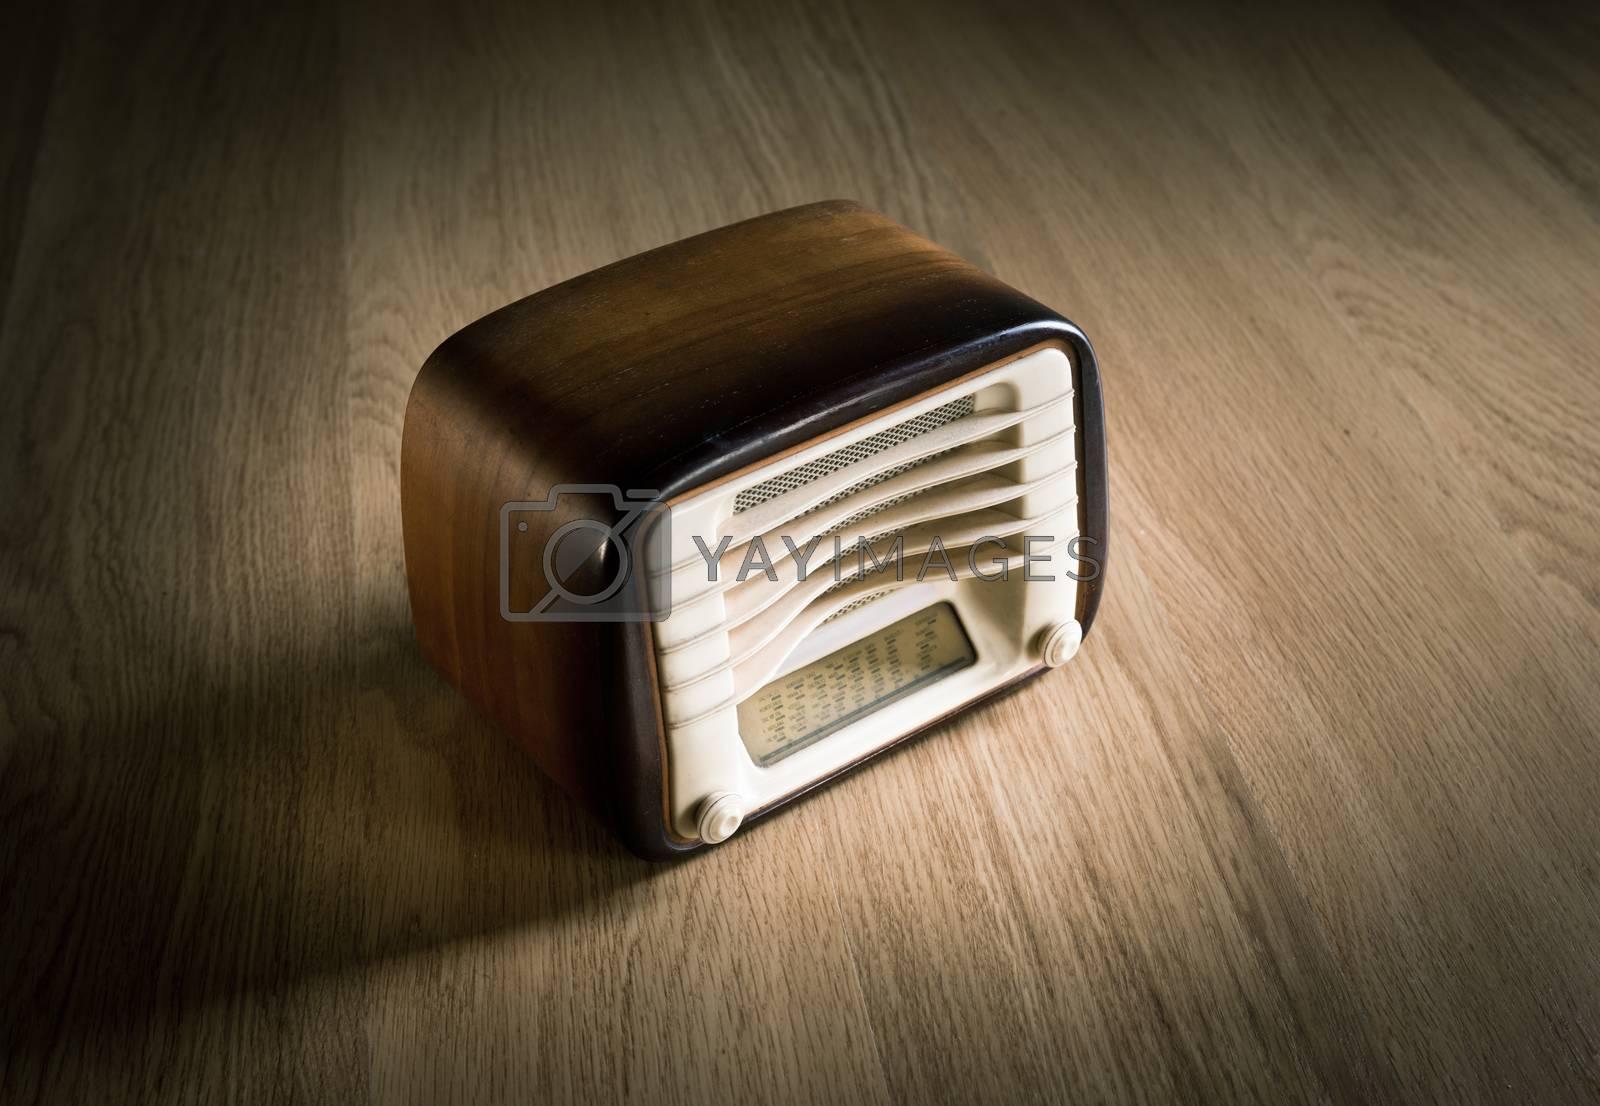 Vintage shiny wooden radio on a wooden desk.